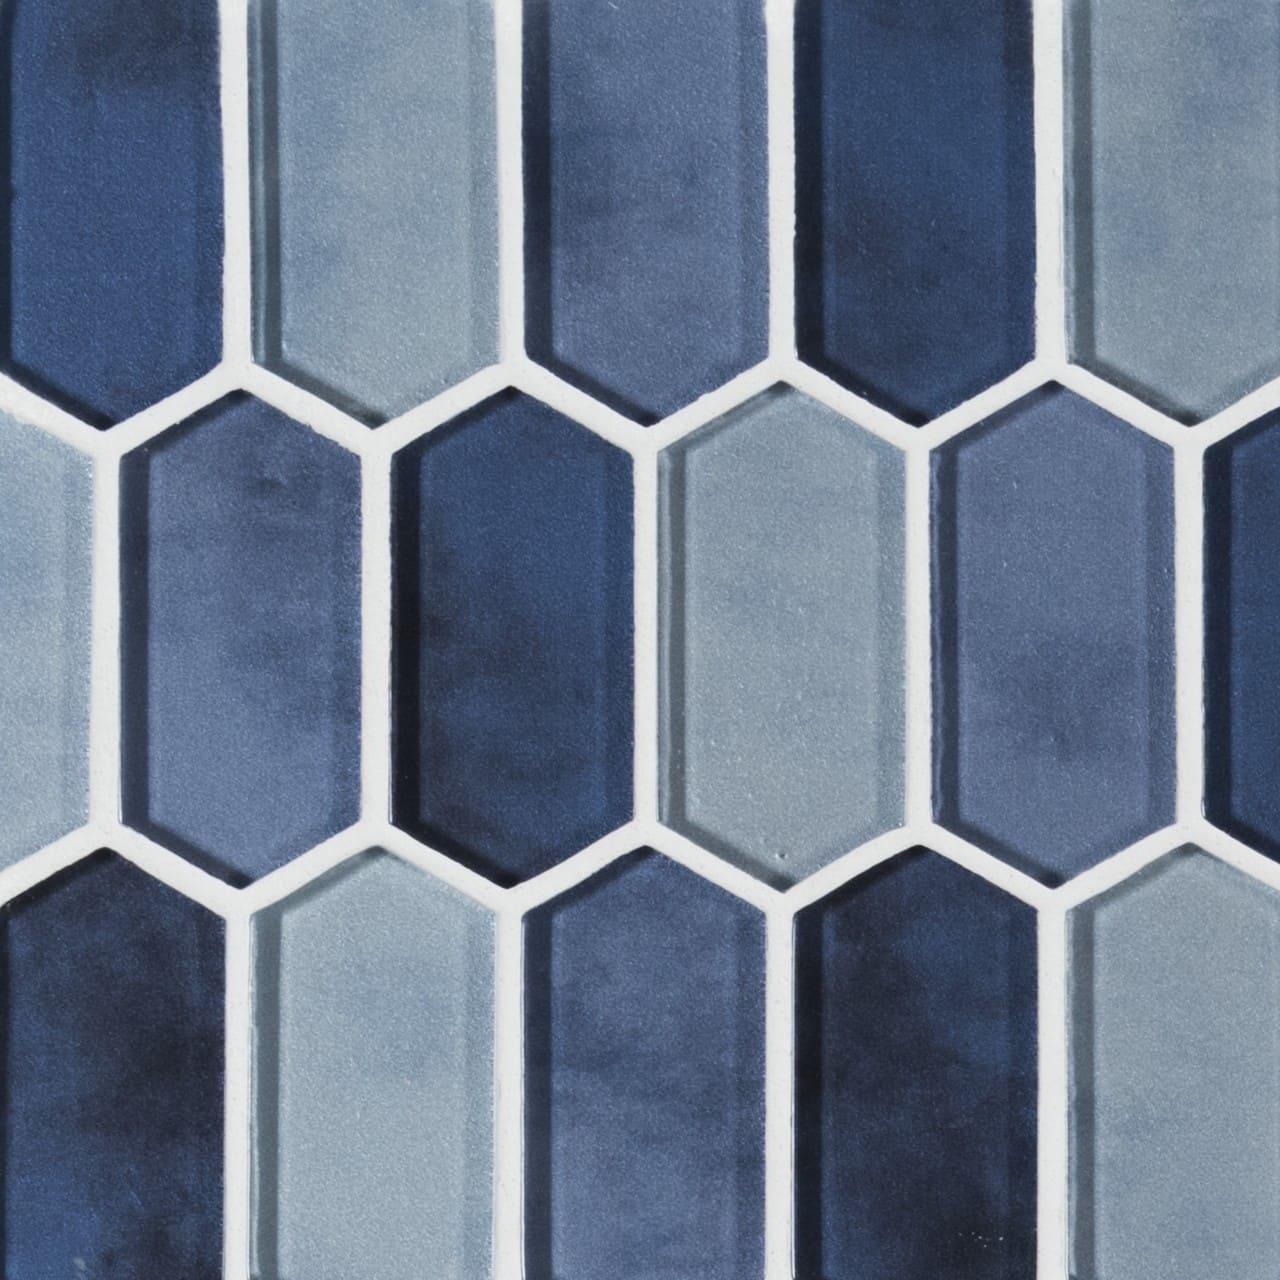 Boathouse Blue Picket Wall Tile